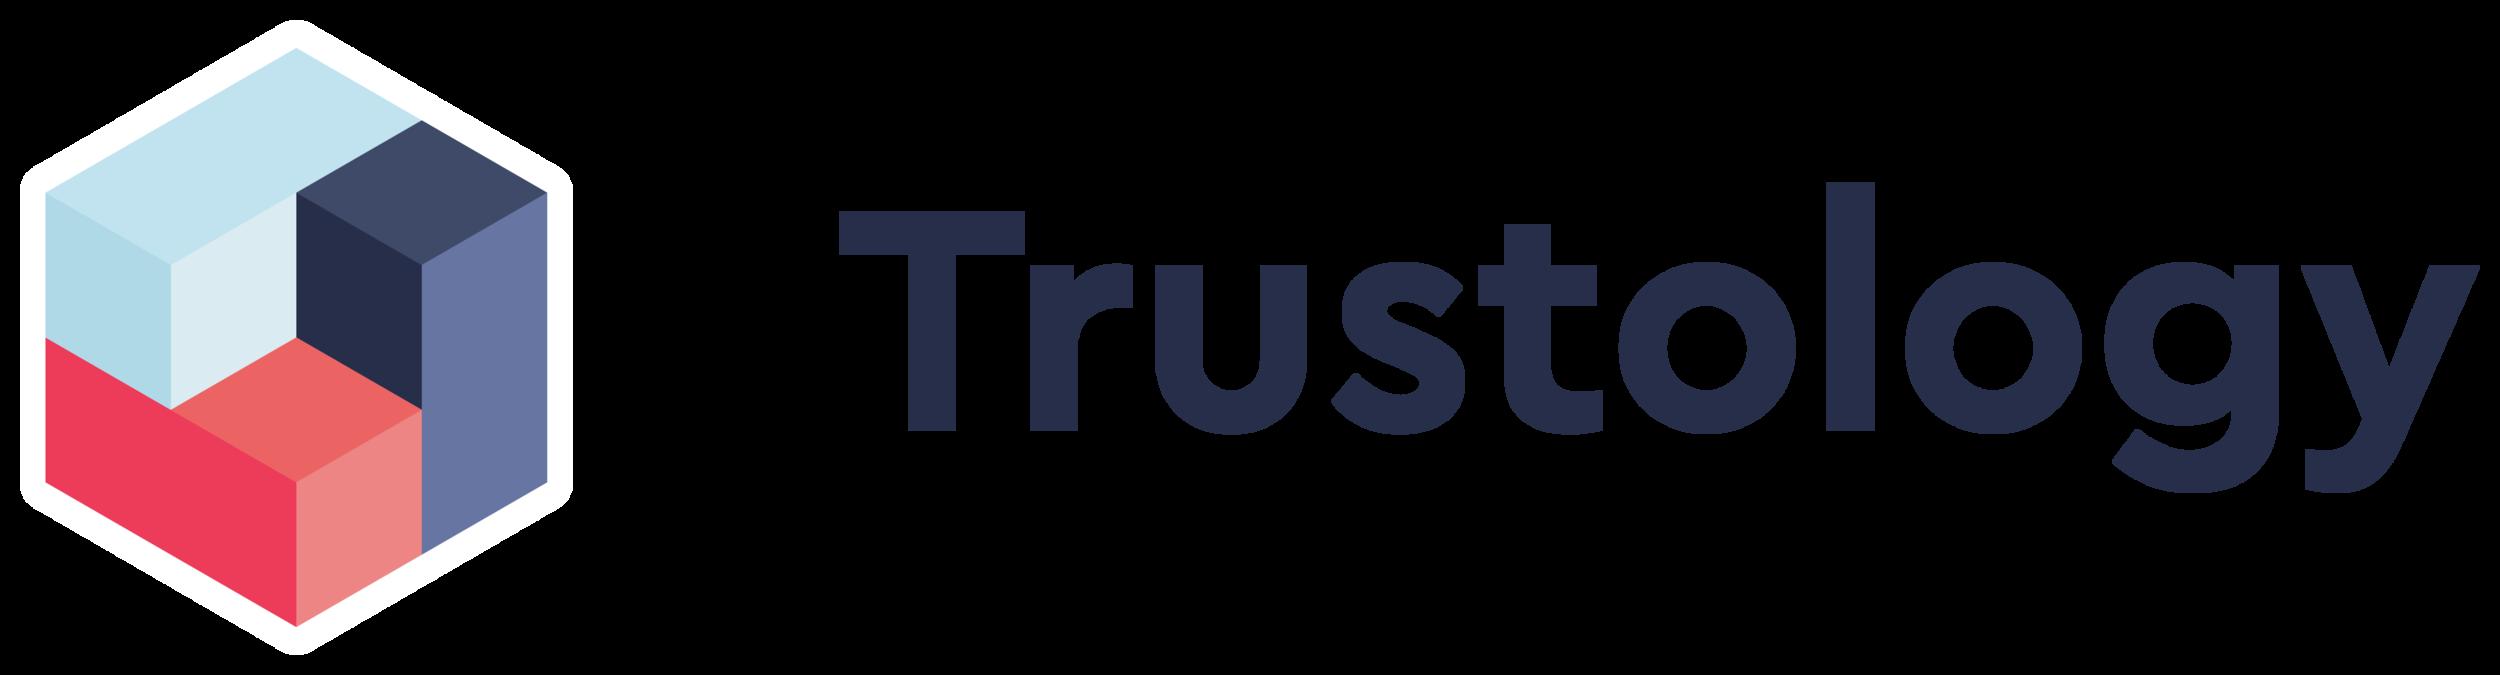 Trustology-Logo high res.png